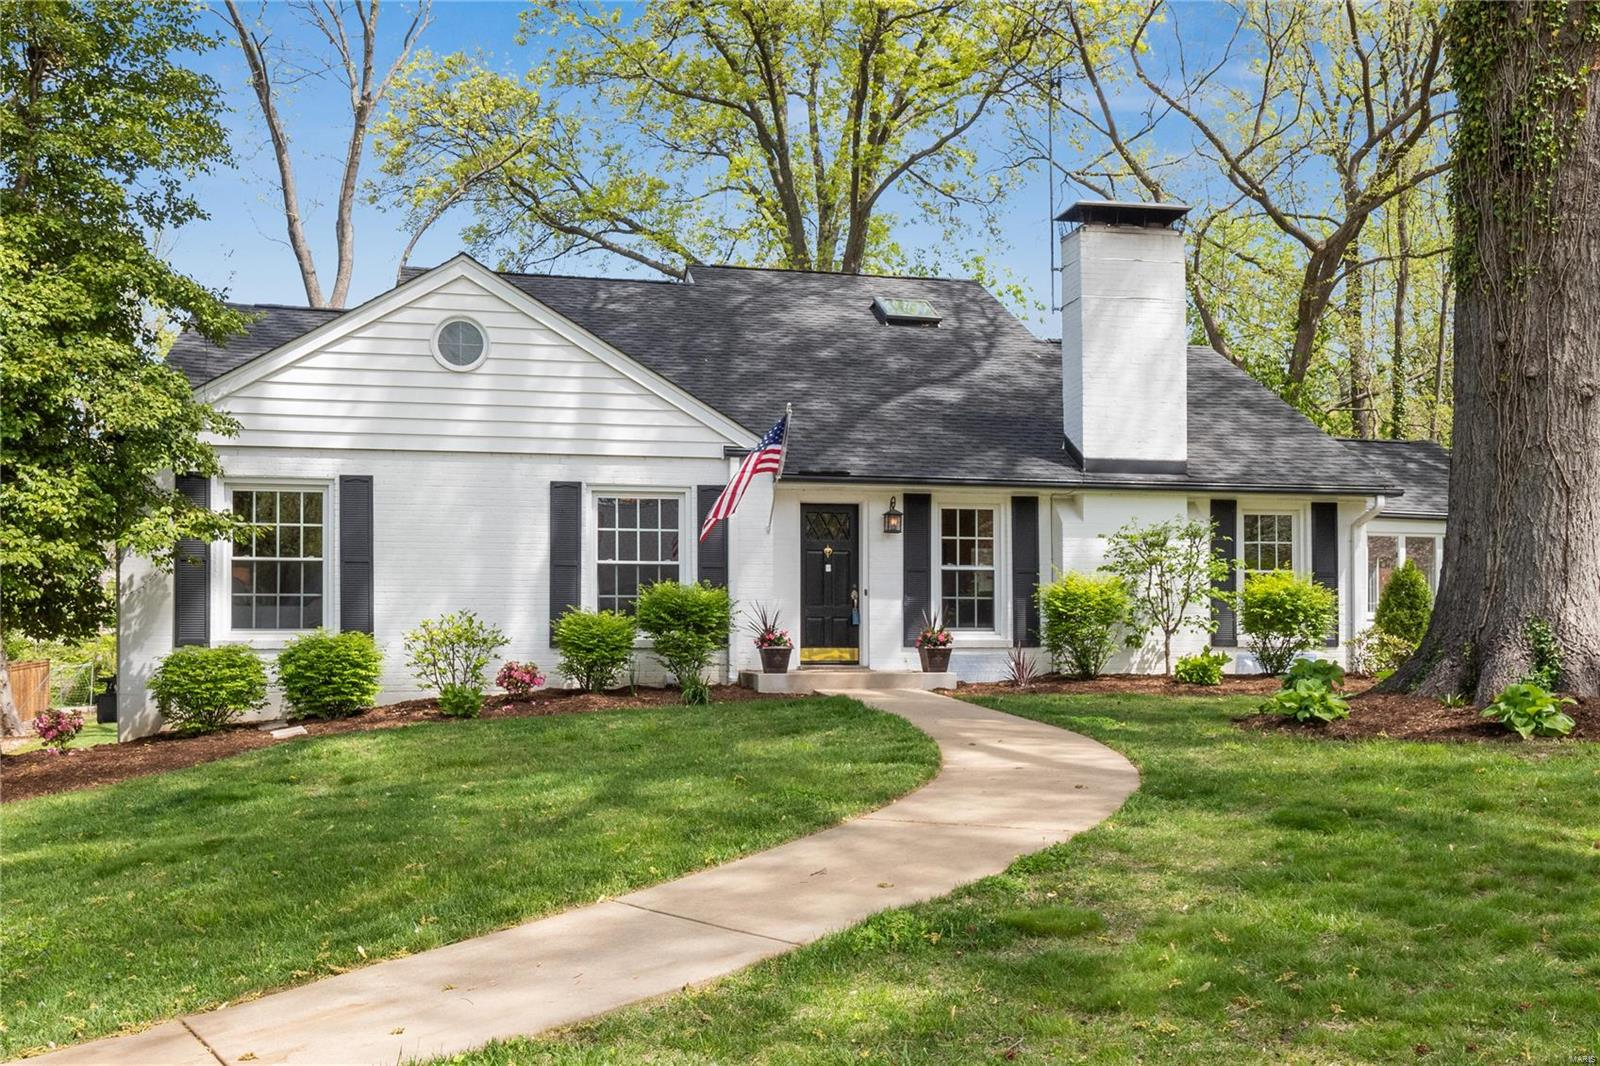 17 S Covington Meadows Property Photo - Olivette, MO real estate listing